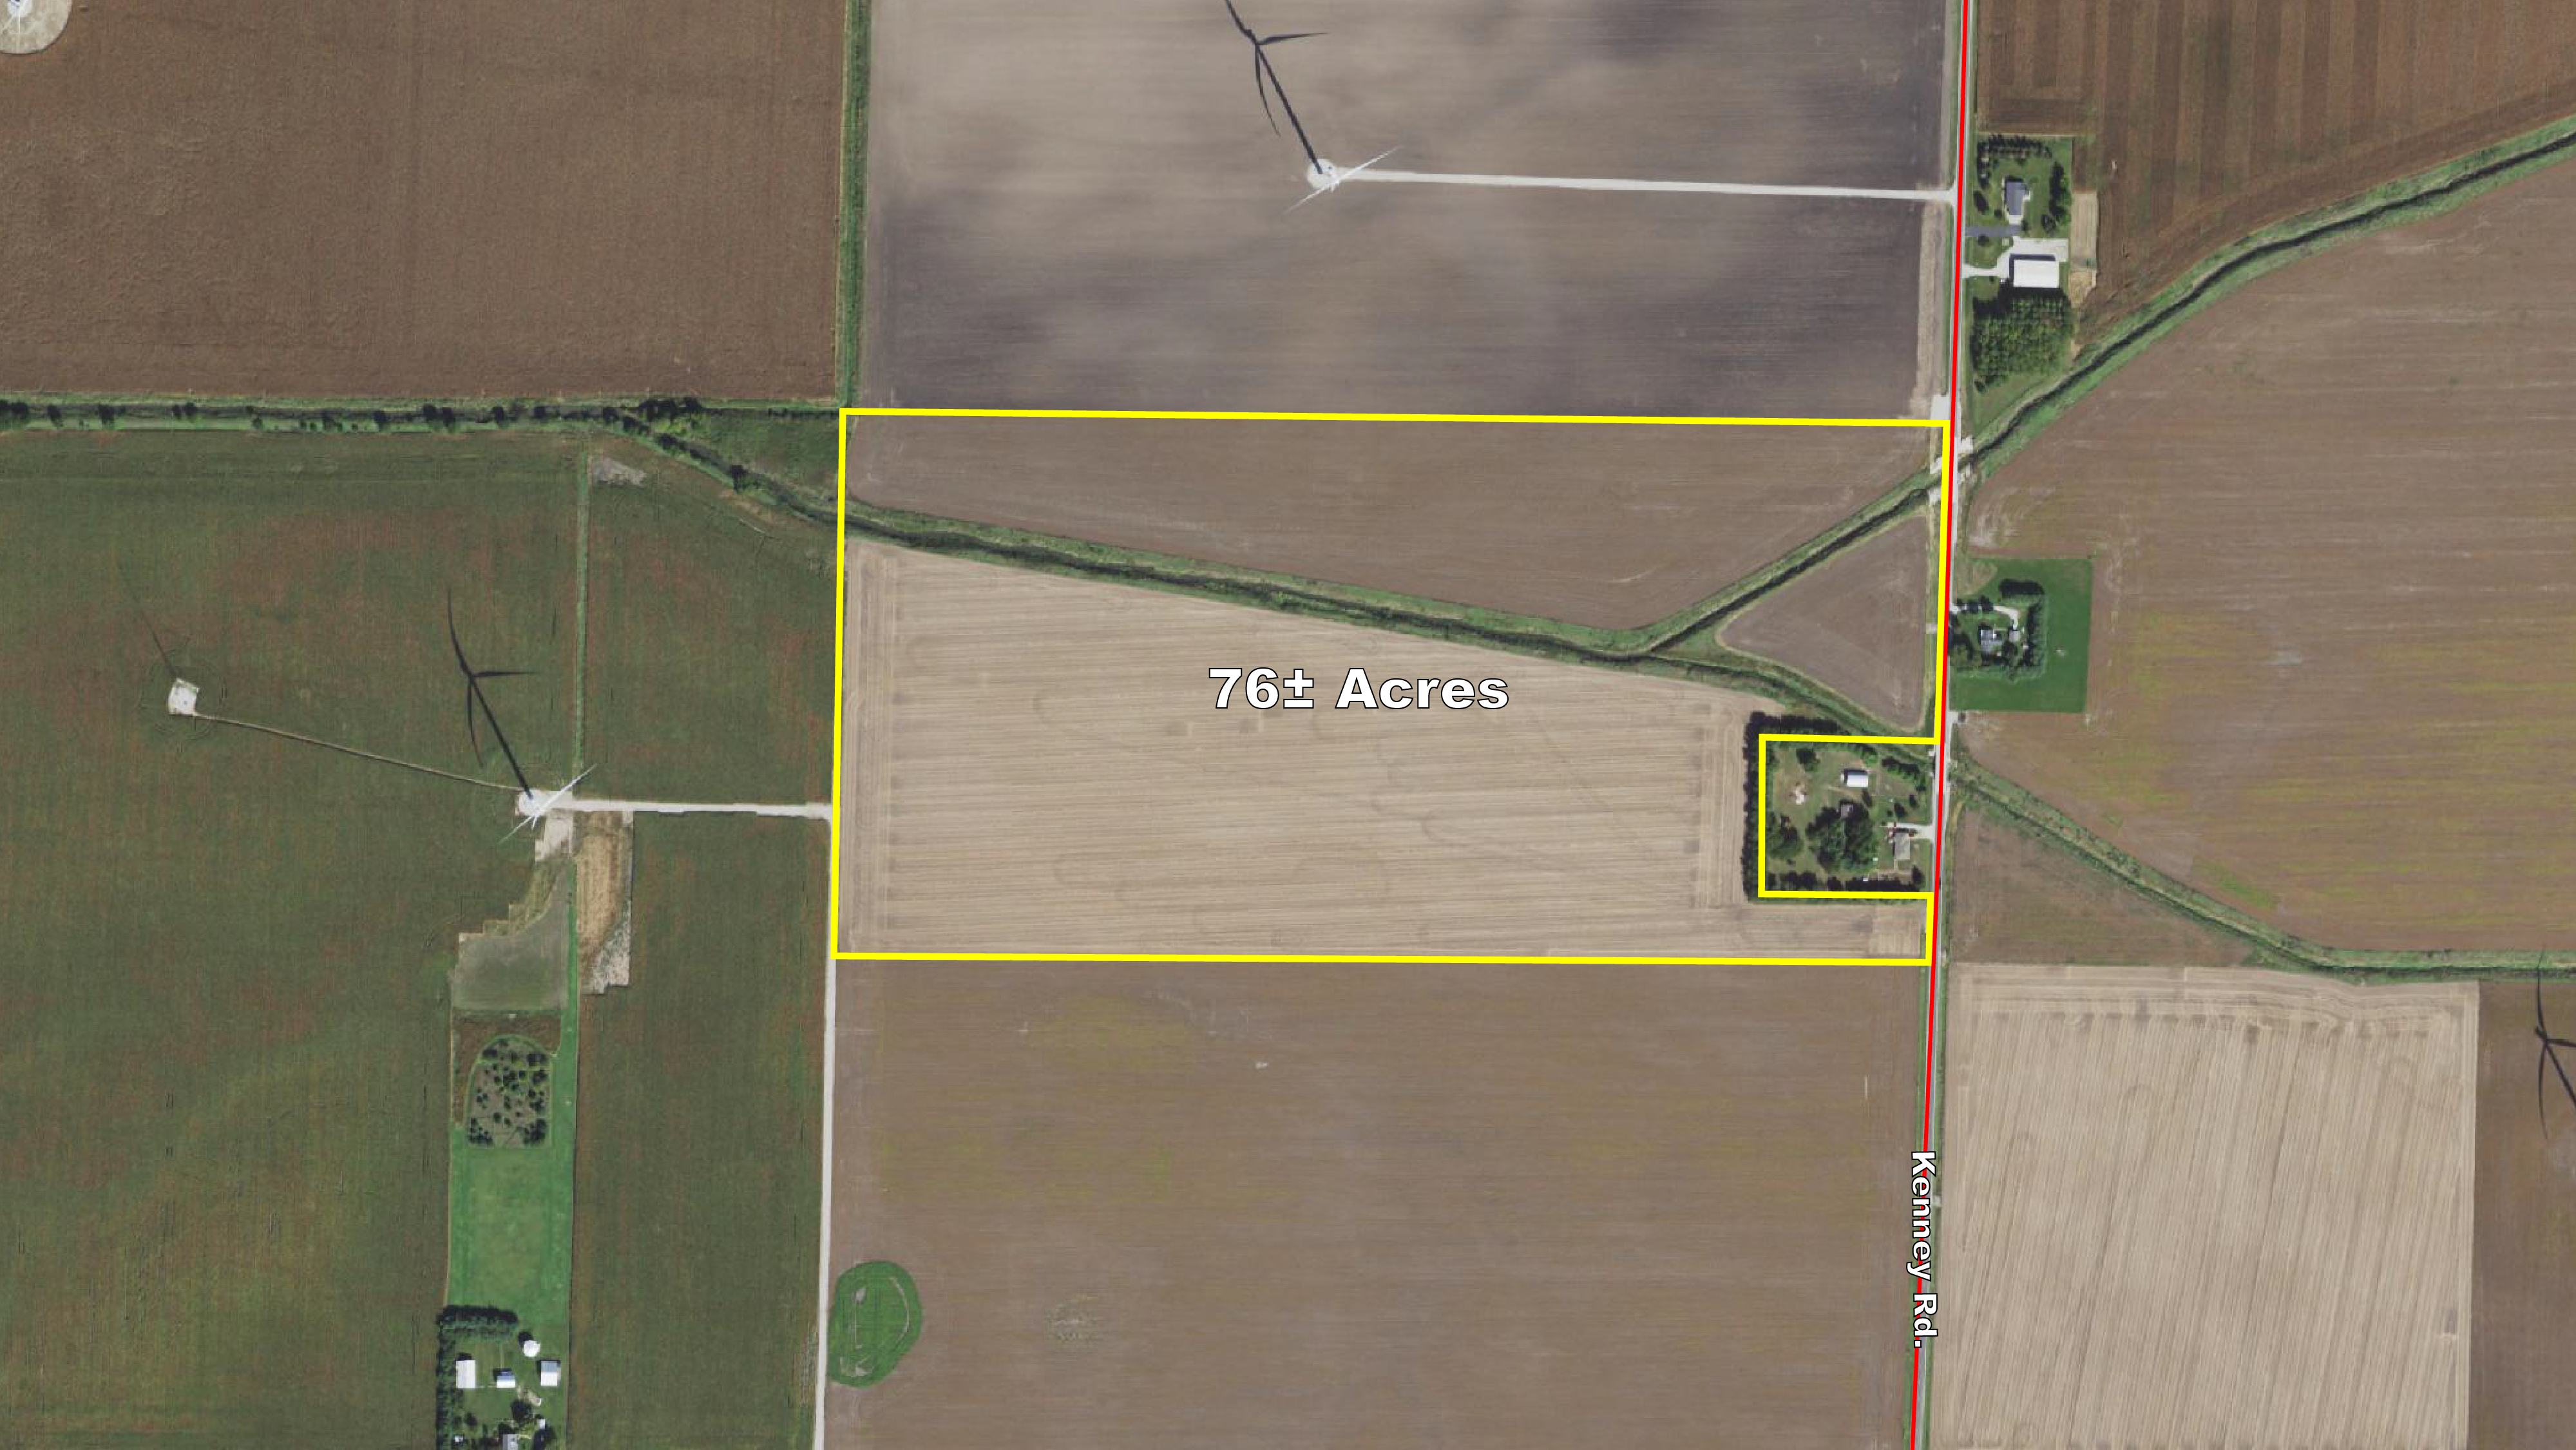 New ListingMacon County, IL - 76± Acres